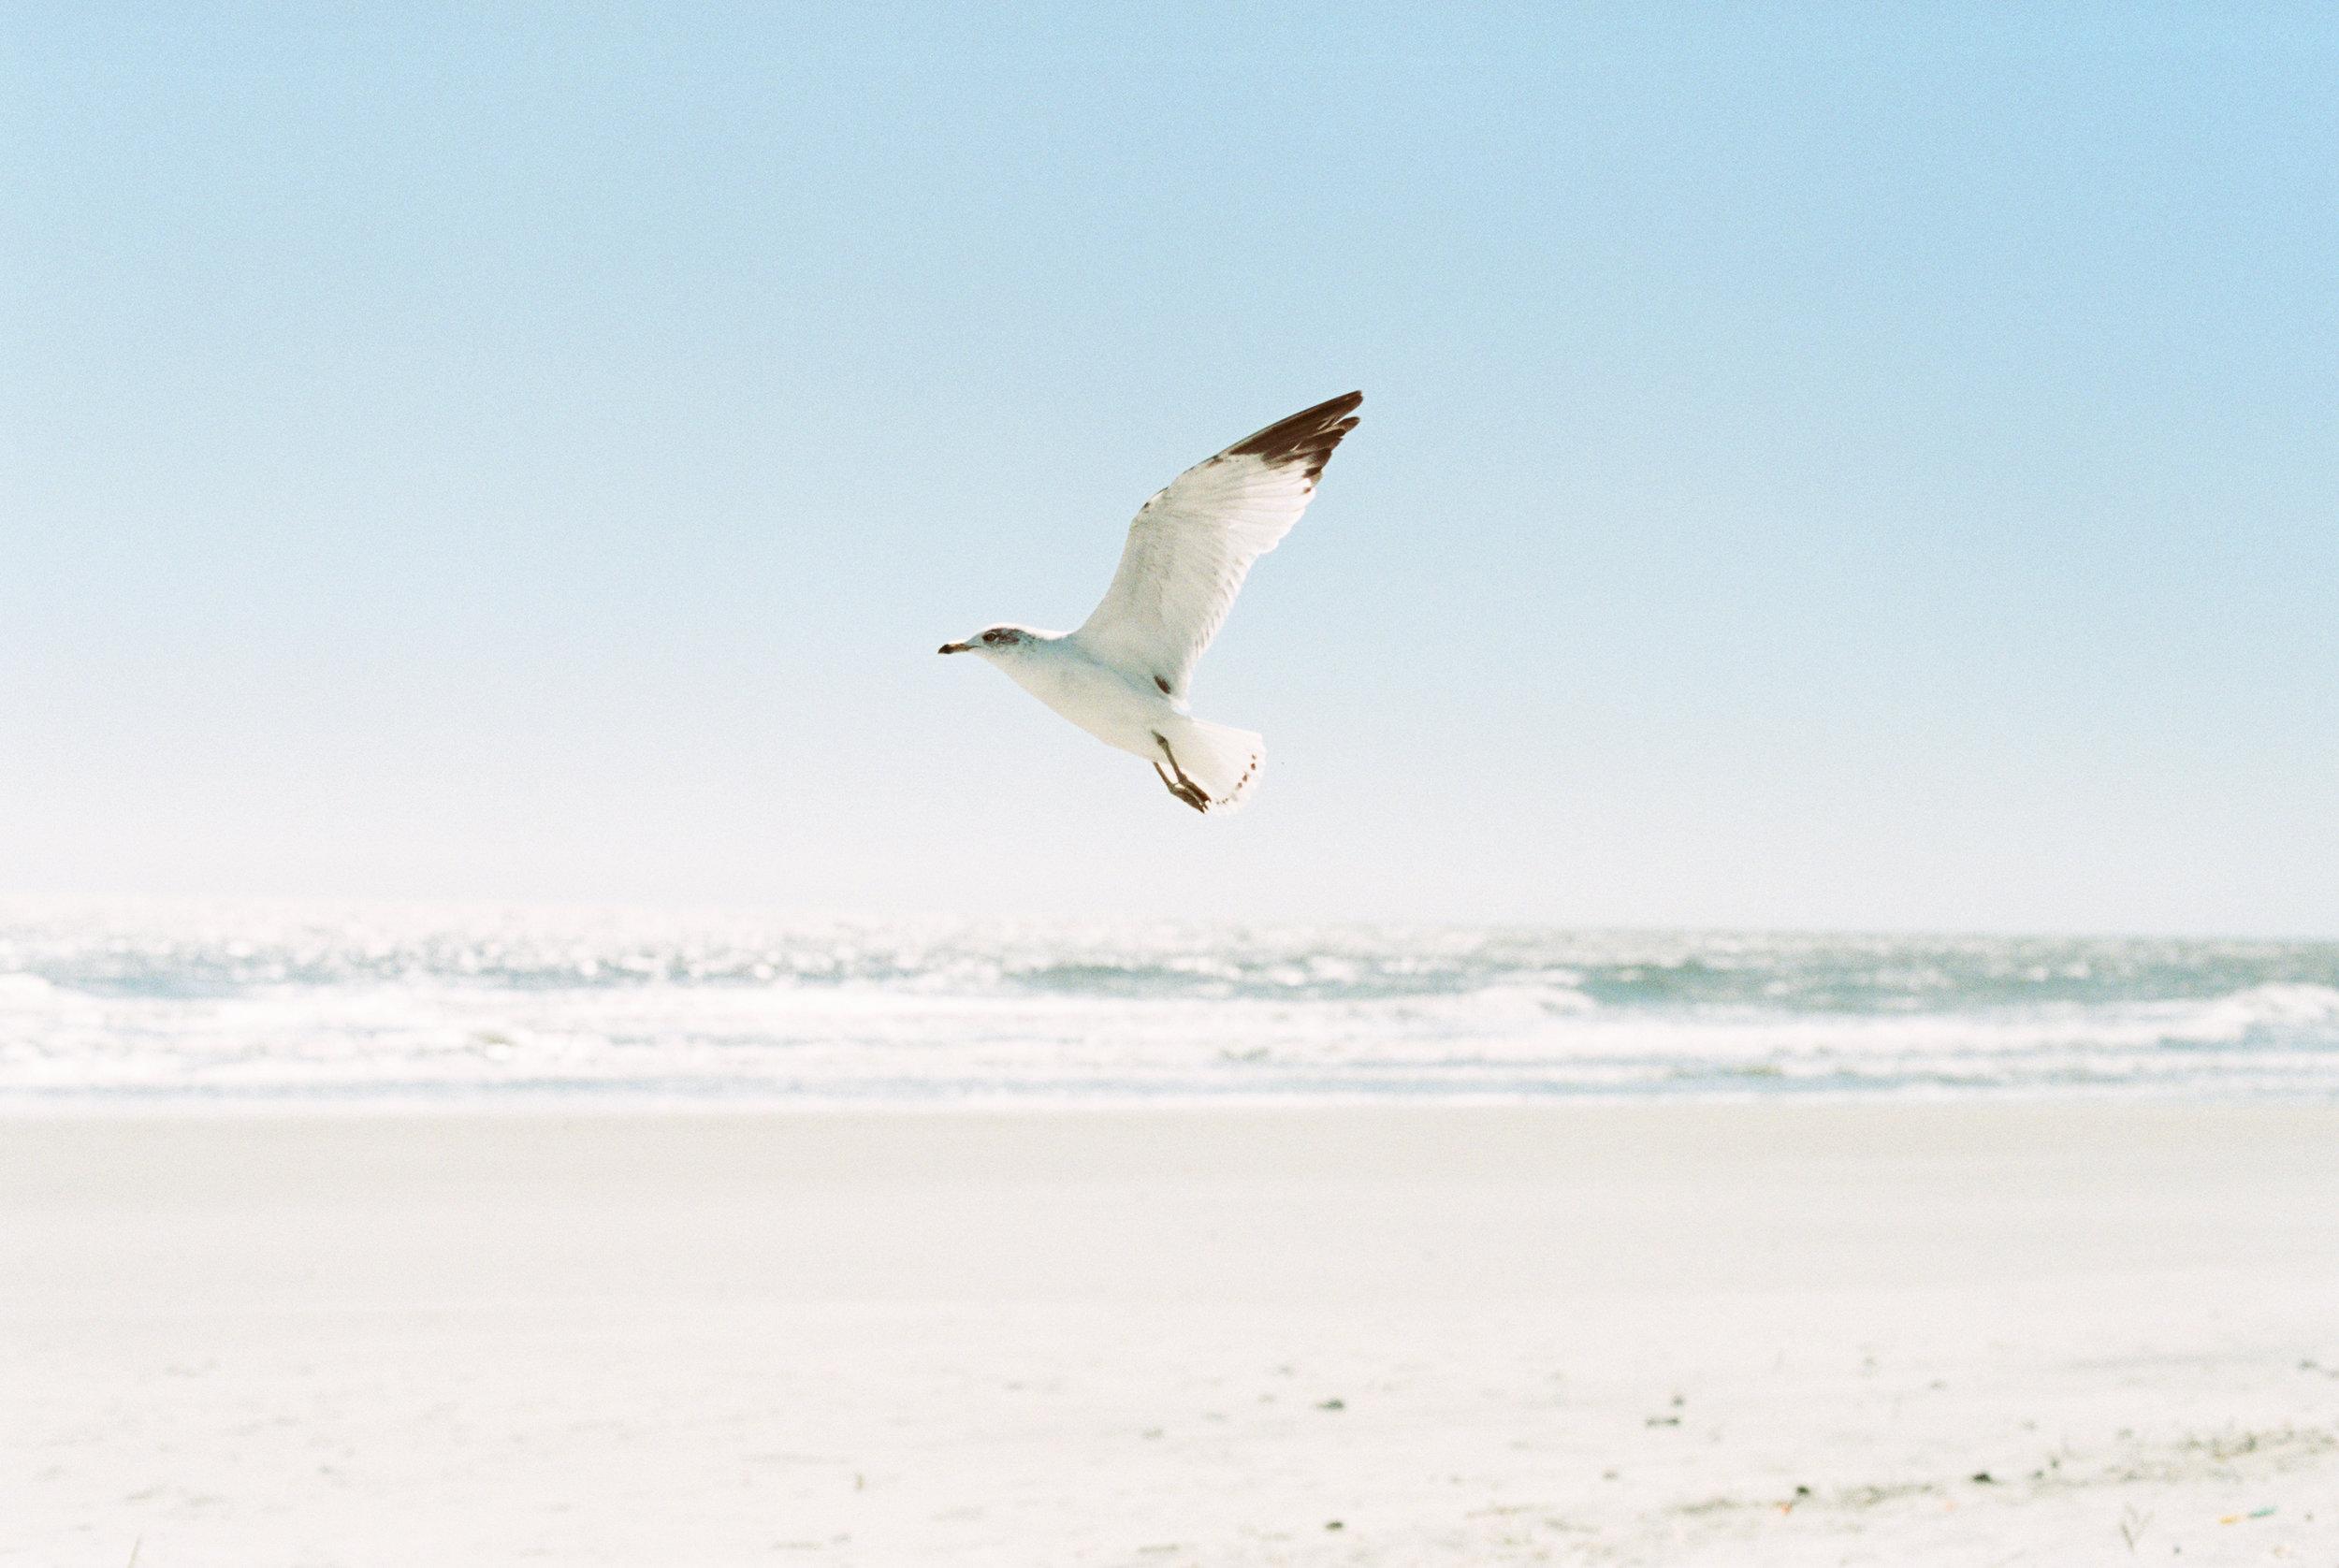 haley-richter-photography-fuji400h-south-carolina-35mm-spring-109.jpg